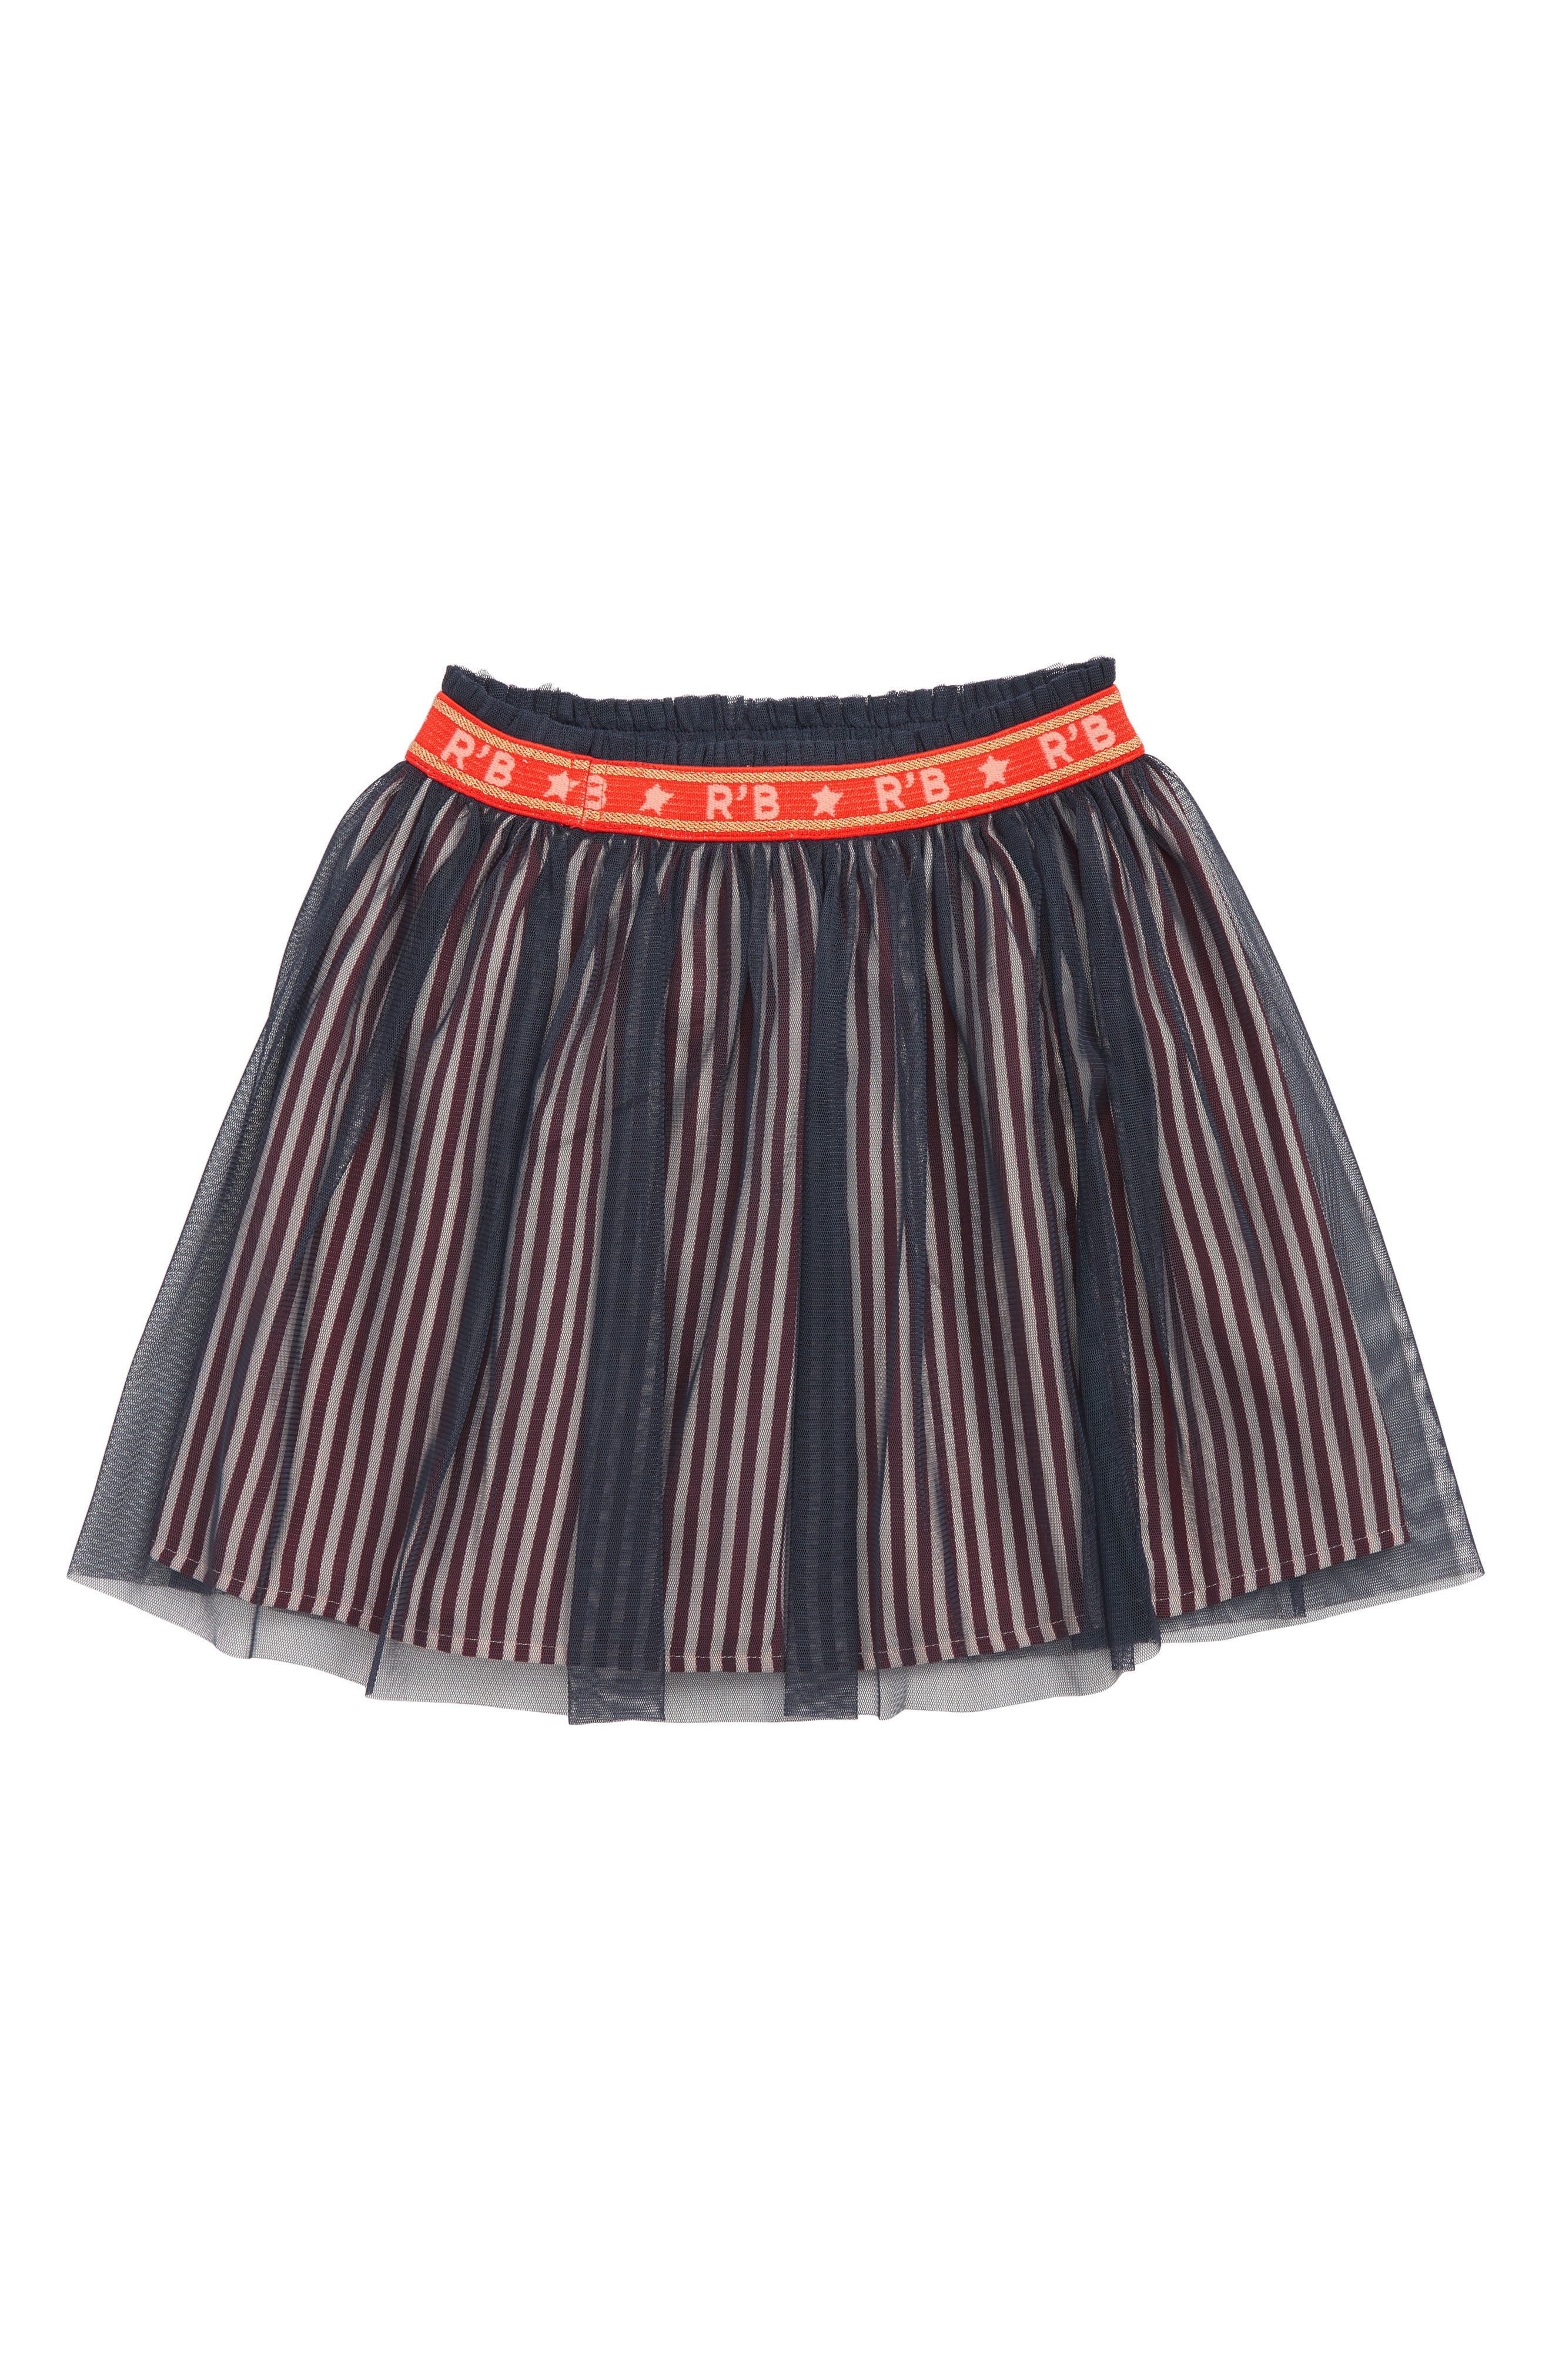 SCOTCH R'BELLE, Tulle Skirt, Main thumbnail 1, color, 593 N